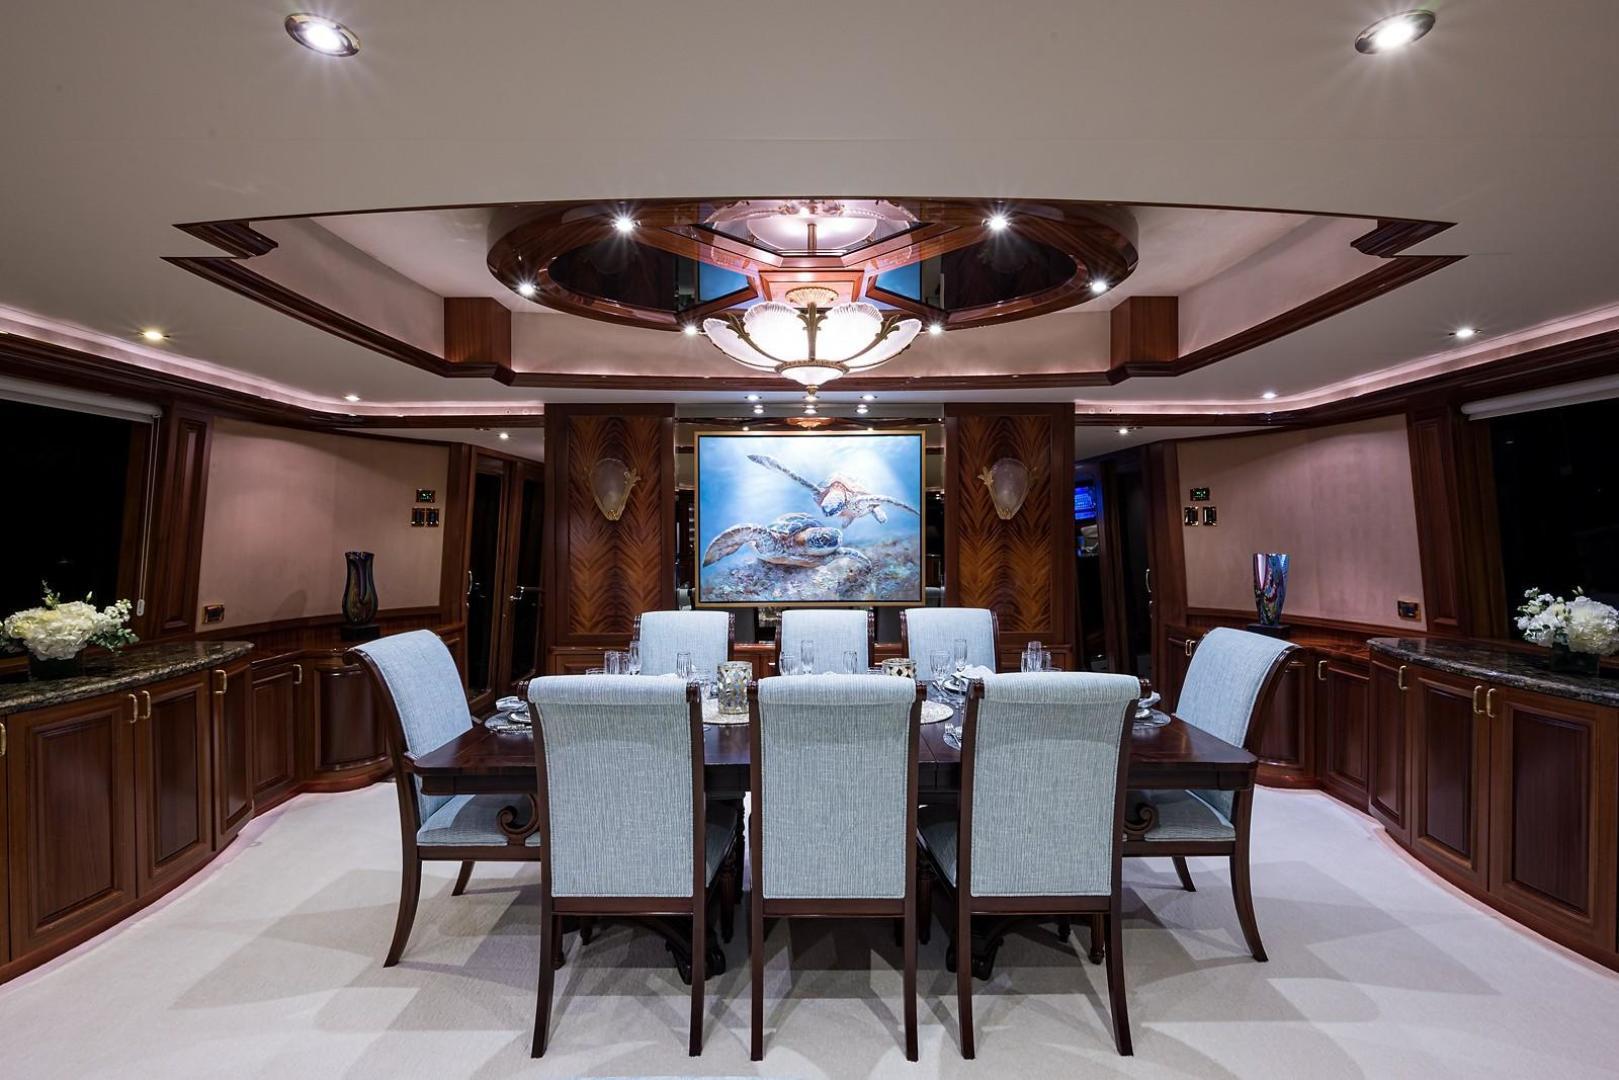 Westport-Motoryacht 2010-Cavallino Fort Lauderdale-Florida-United States-Dining-1270123 | Thumbnail